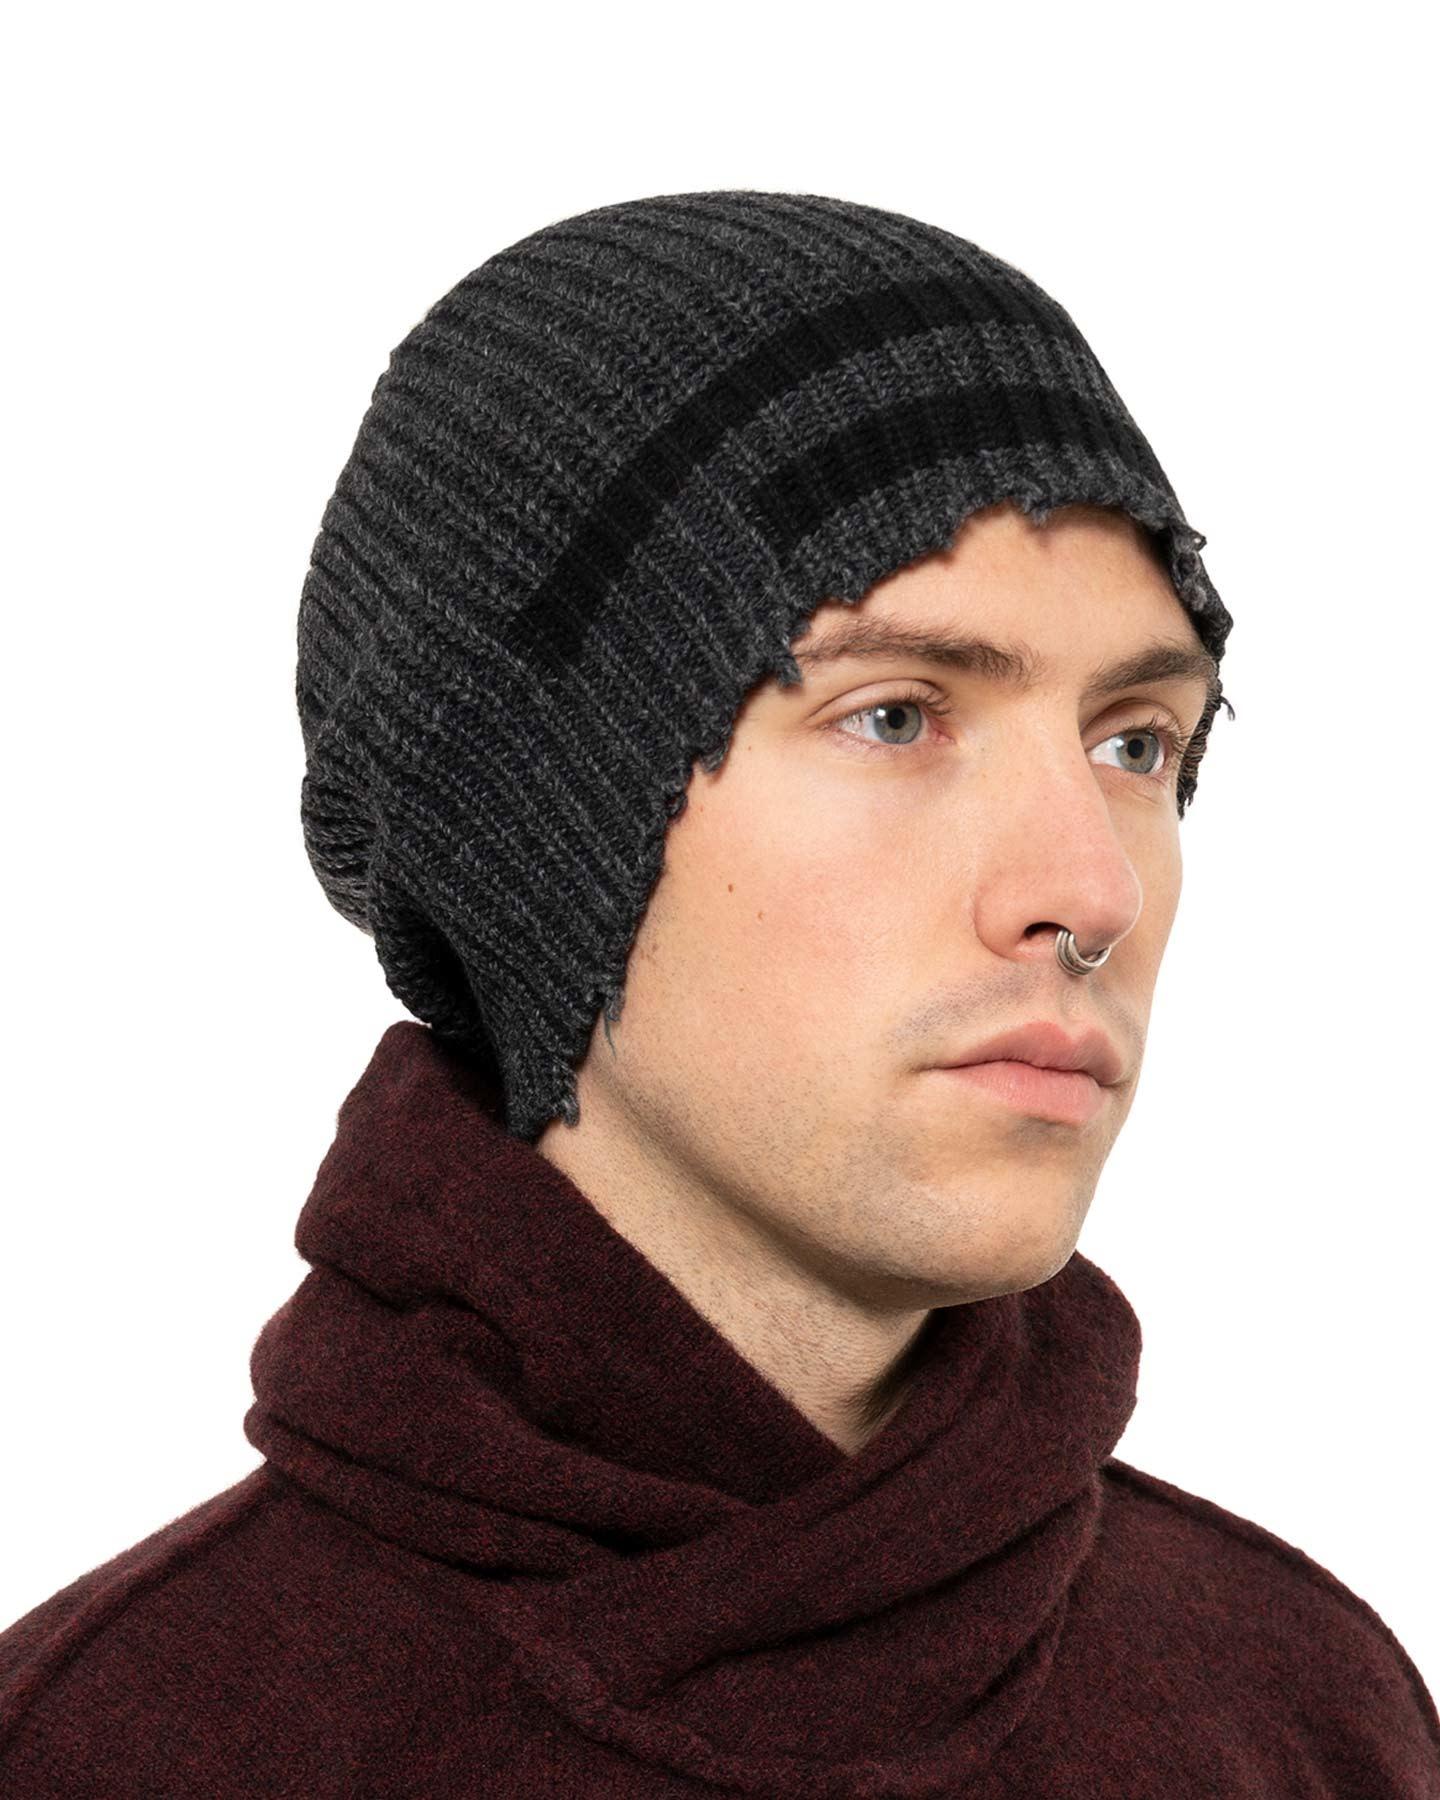 RAW CUT COLLEGE HAT - GRAPHITE